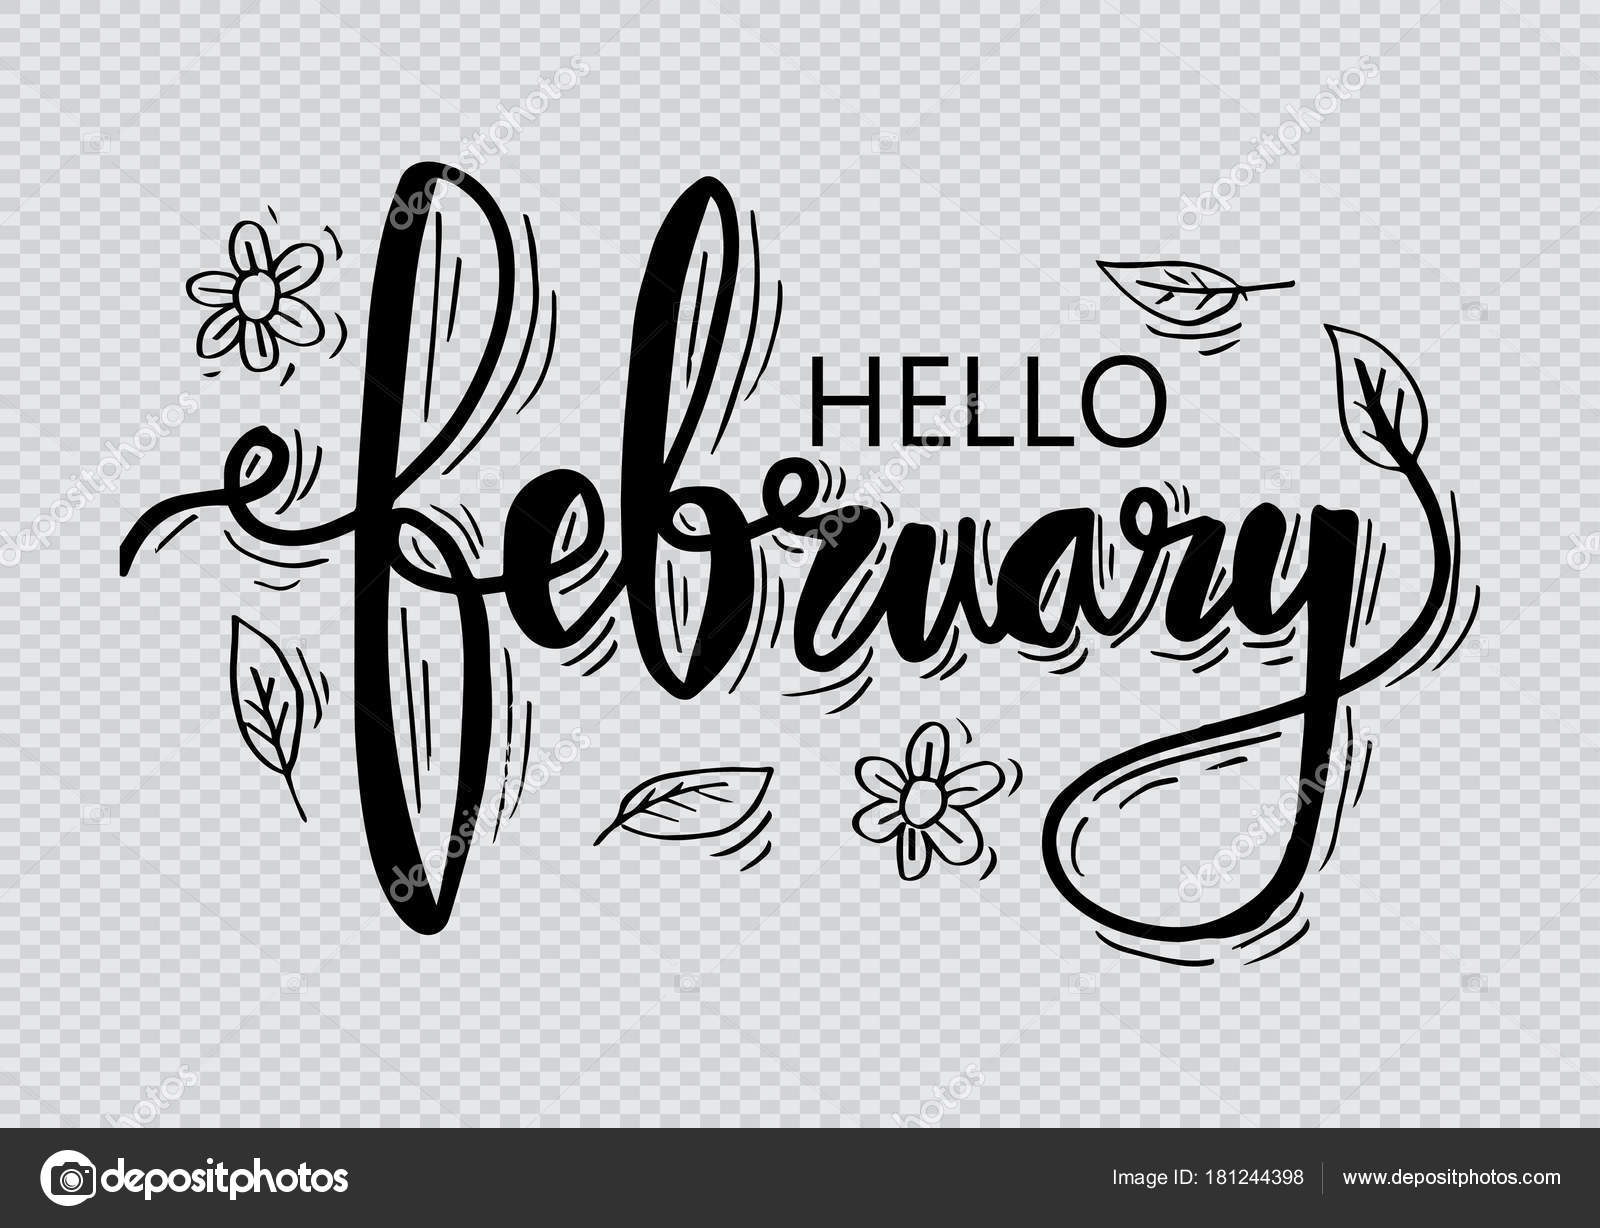 Hello February Hand Lettering — Stock Photo © Handini #181244398